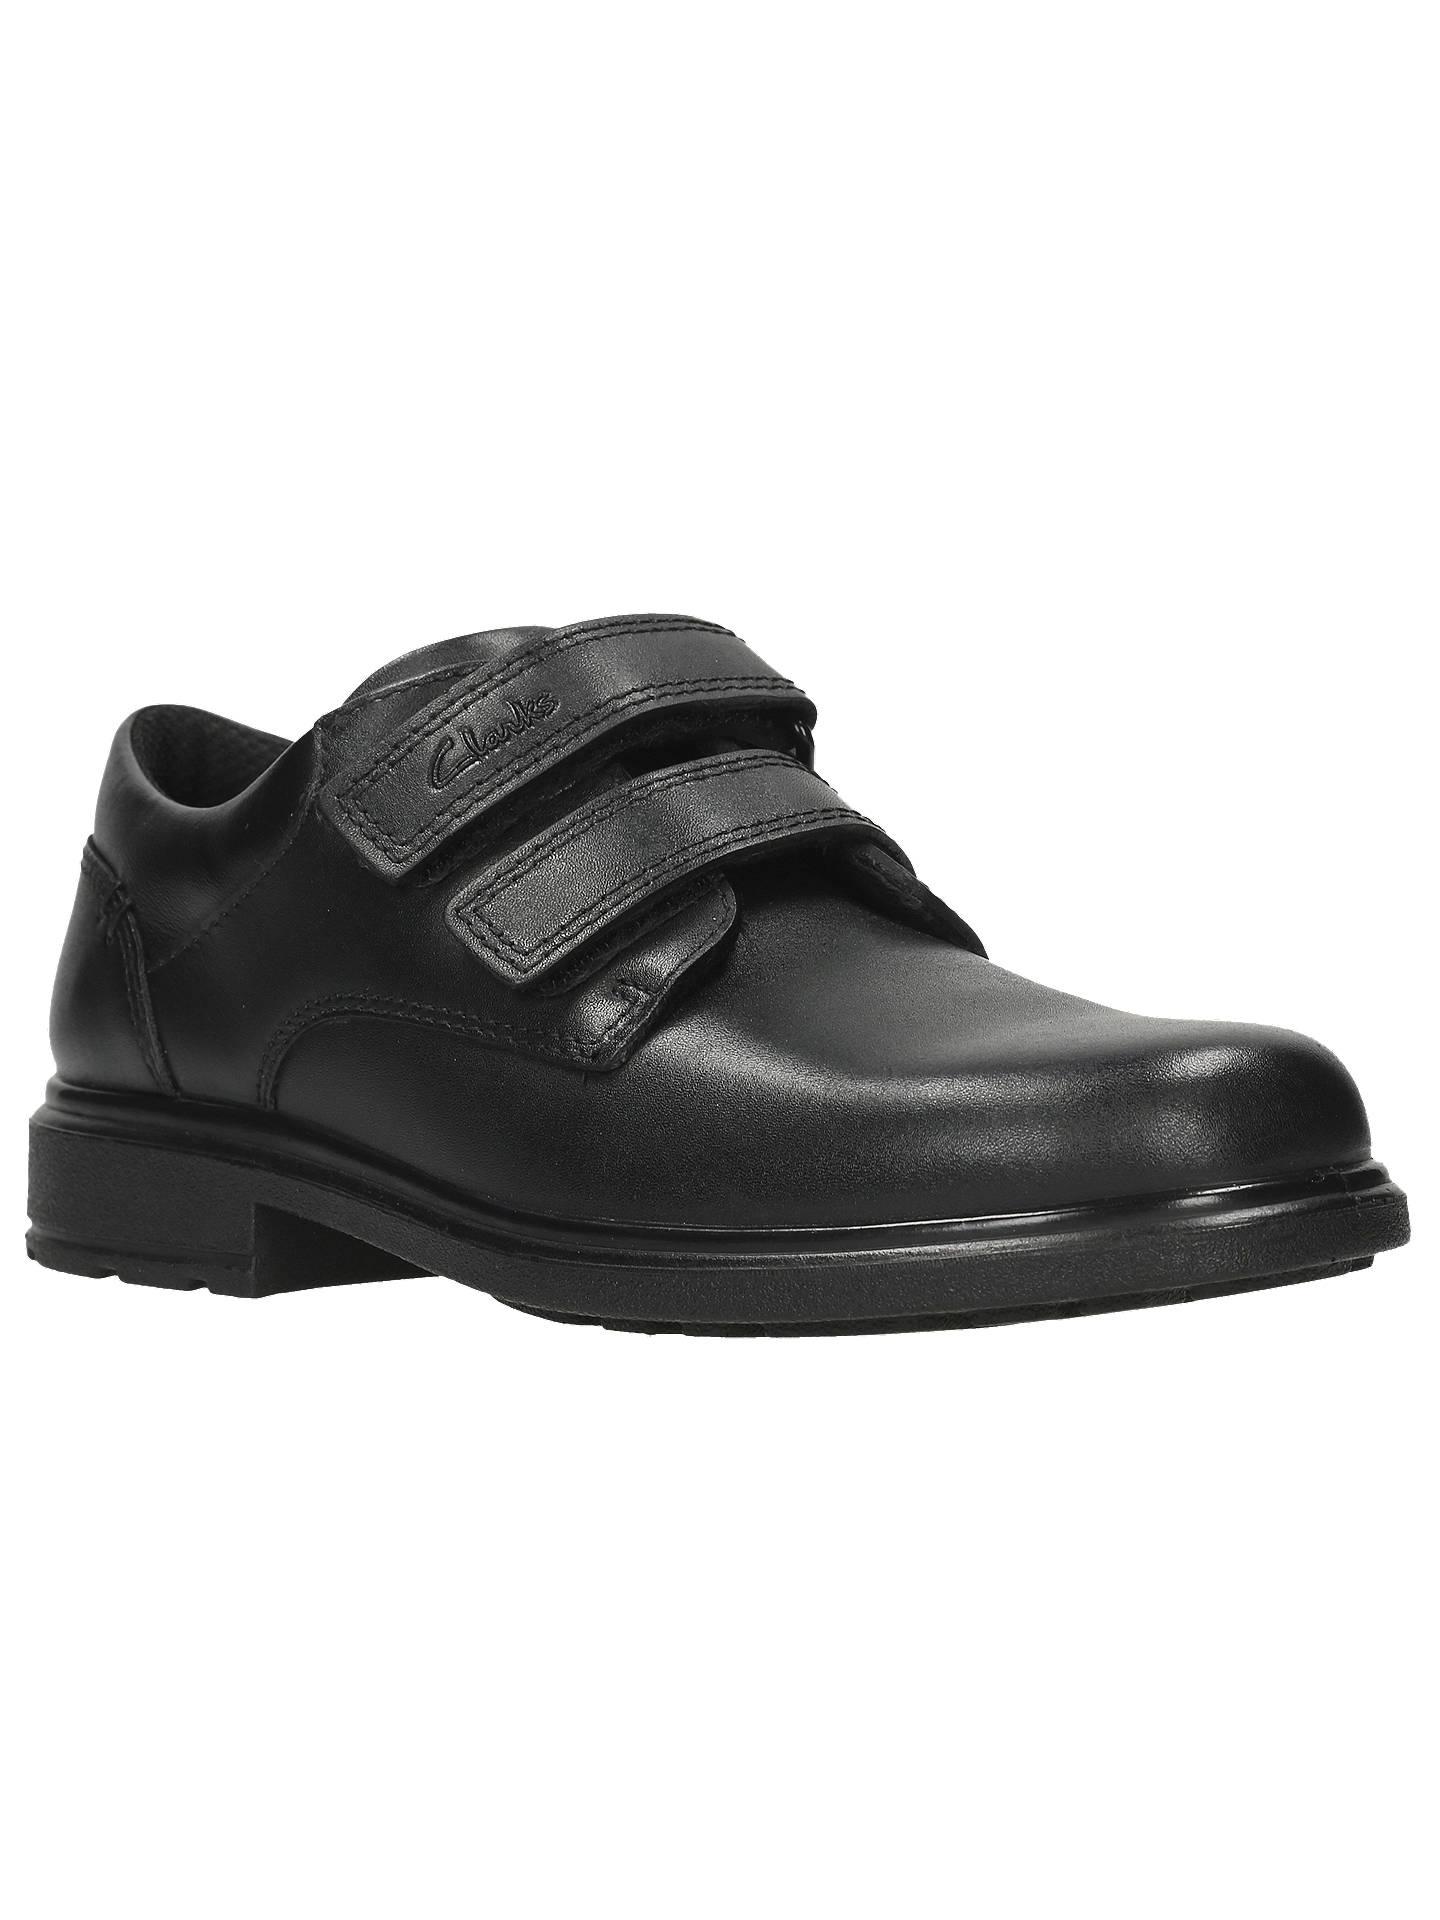 Boys Clarks Remi Pace Inf /& Jnr Black Leather Smart School Shoes